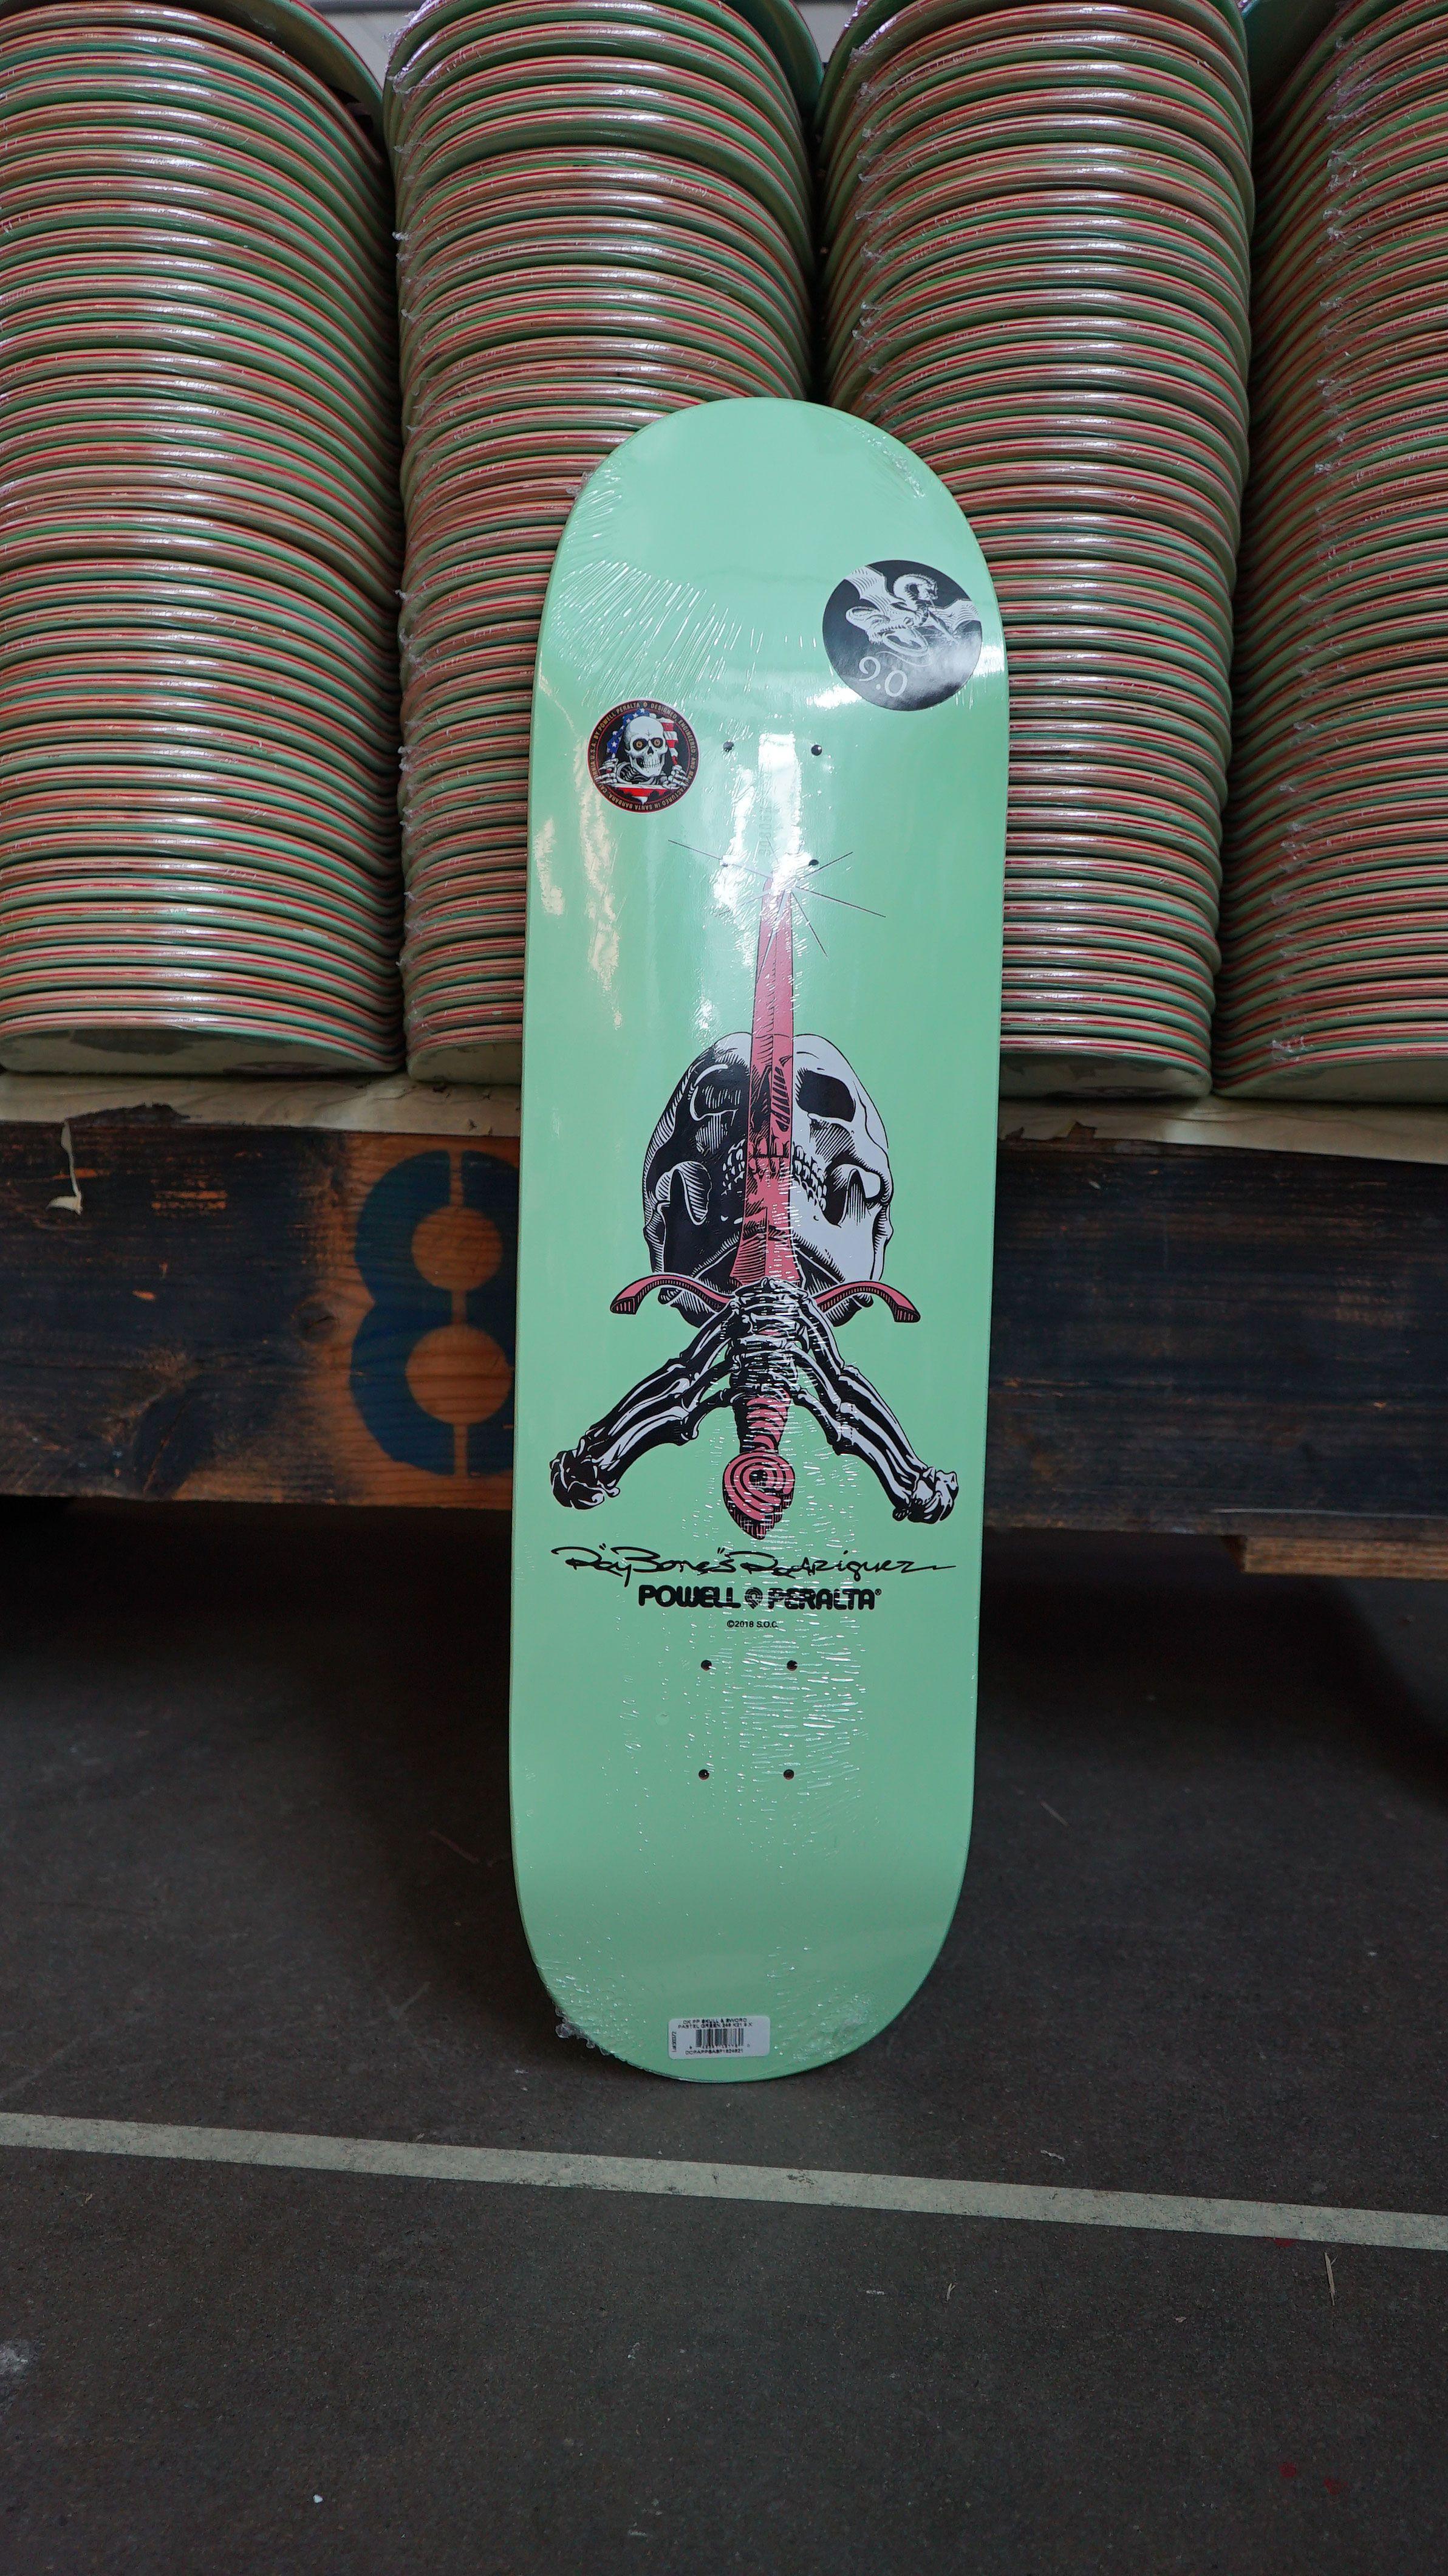 Powell Peralta Skull And Sword Skateboard Deck Pastel Green 246 K21 9 05 X 32 95 Skateboard Deck Art Powell Peralta Skateboard Decks